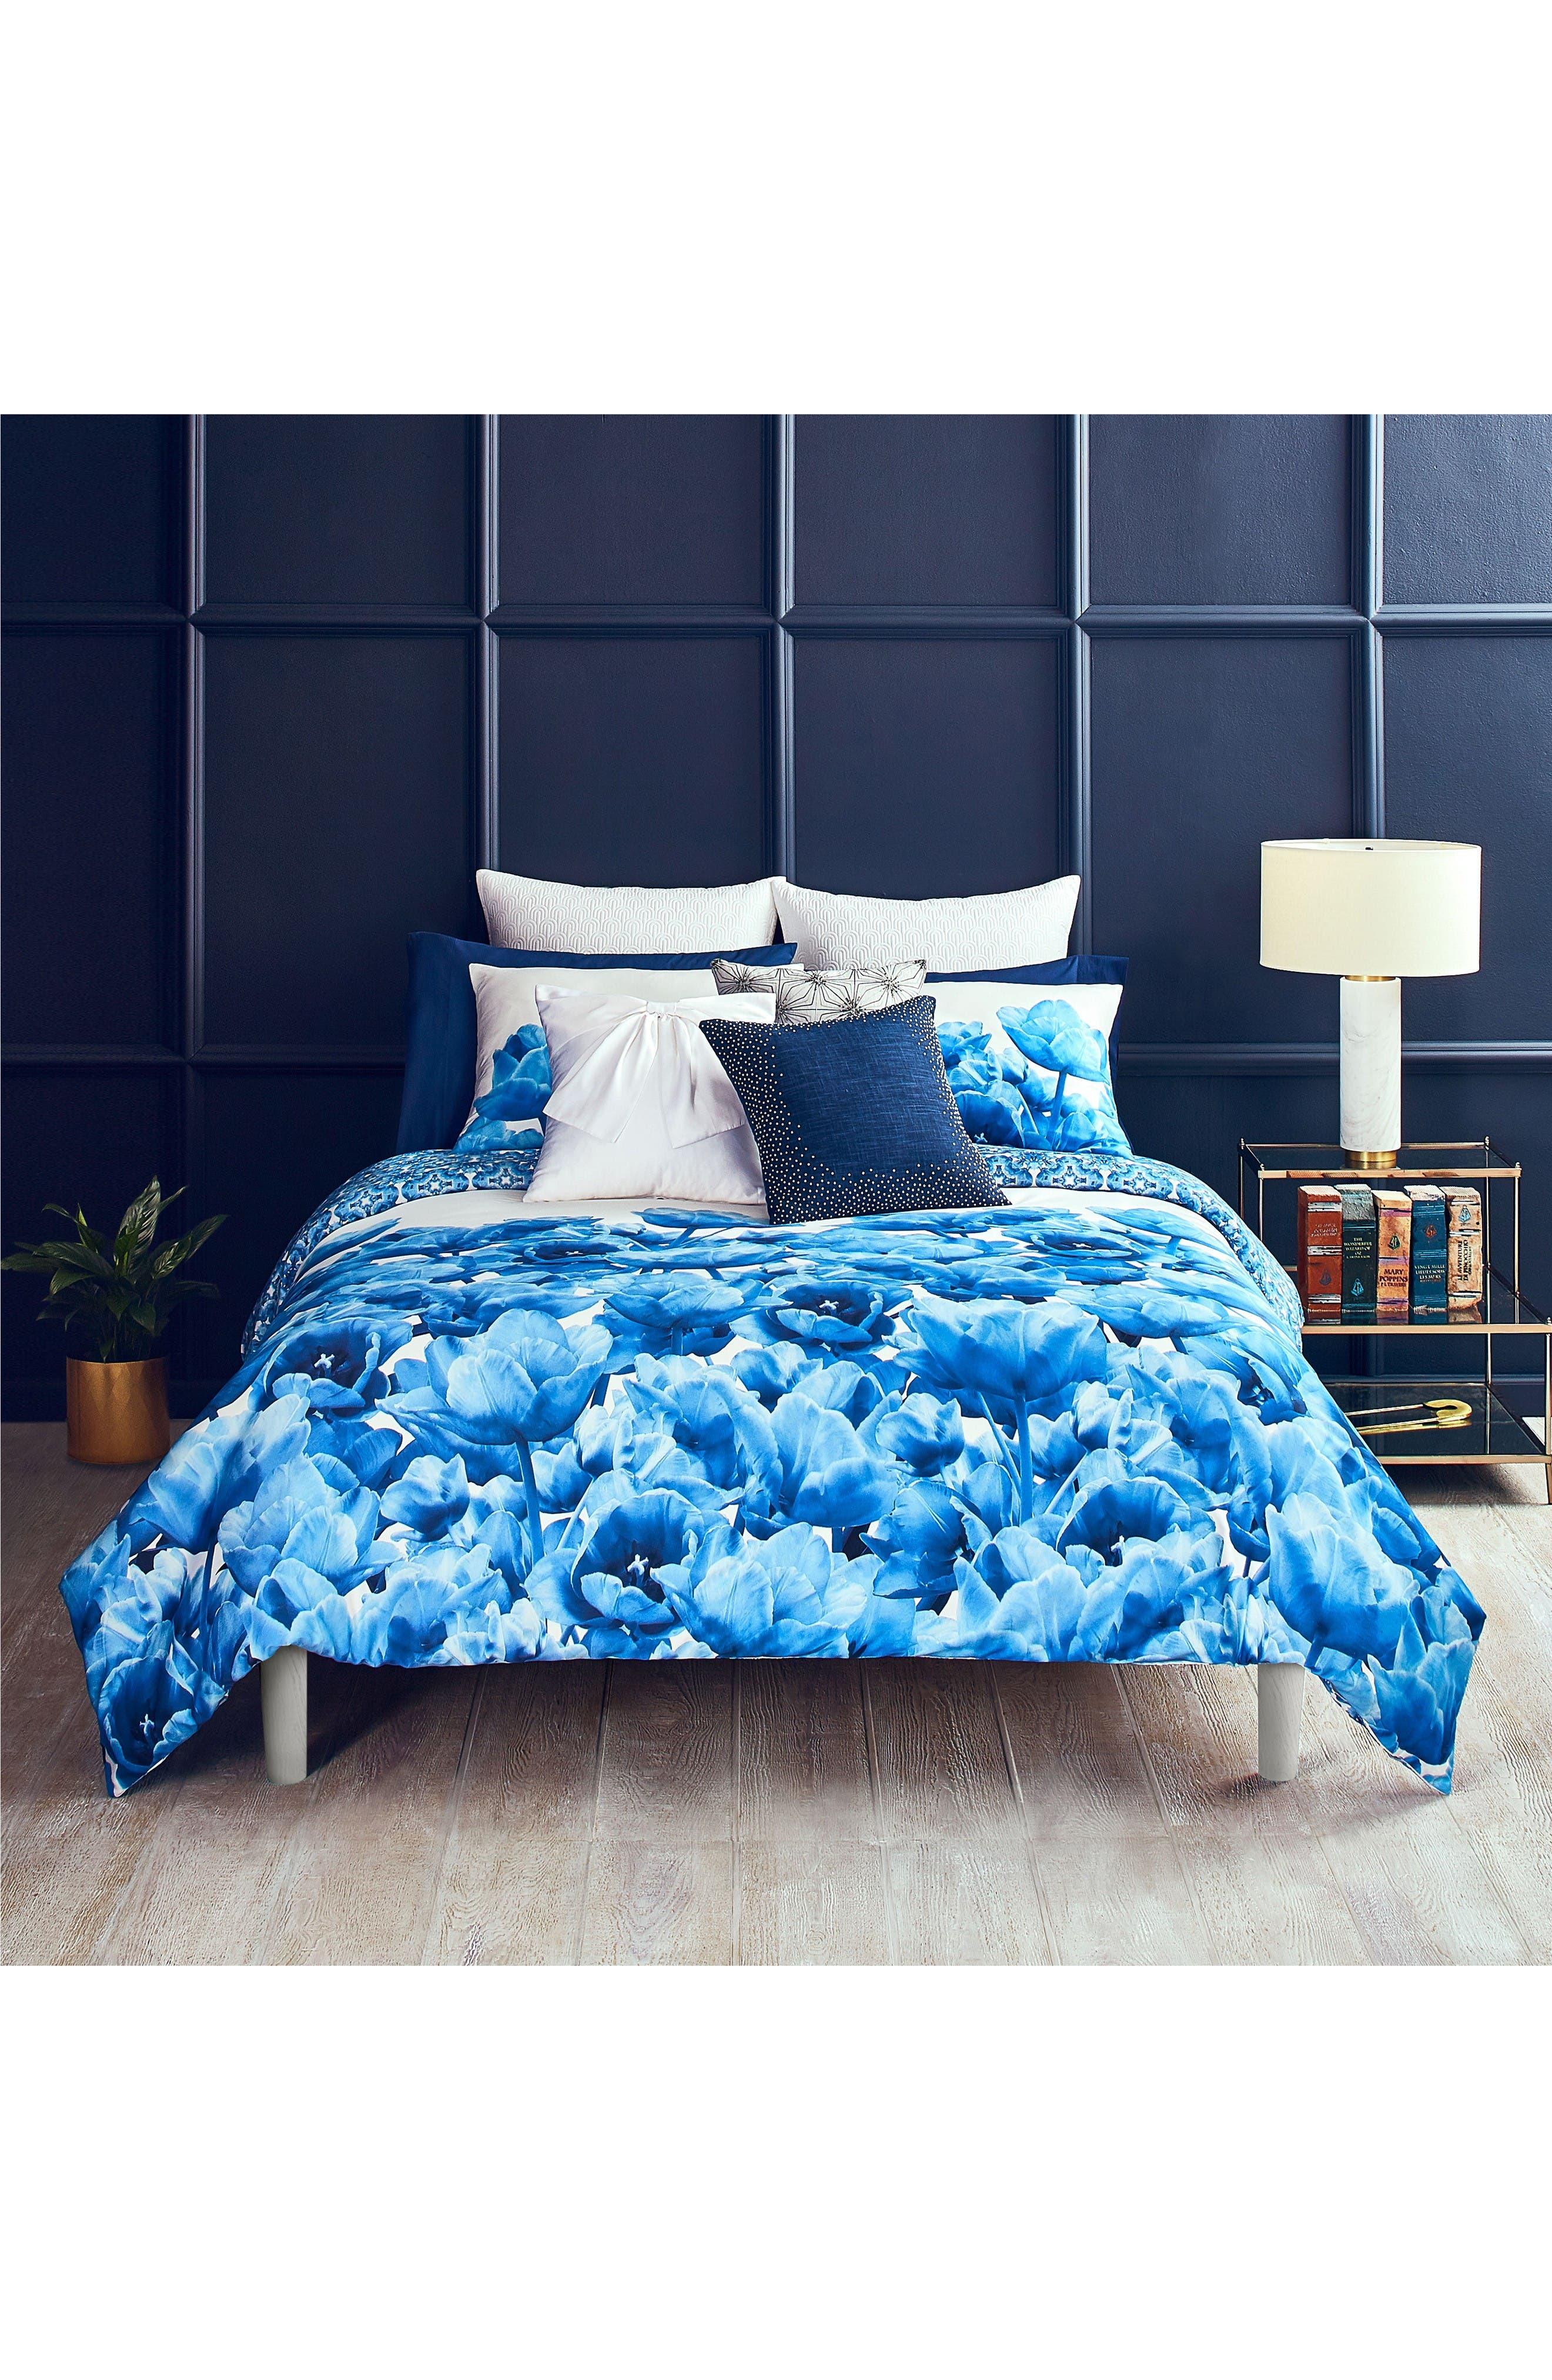 Alternate Image 1 Selected - Ted Baker London Blue Beauty Comforter & Sham Set